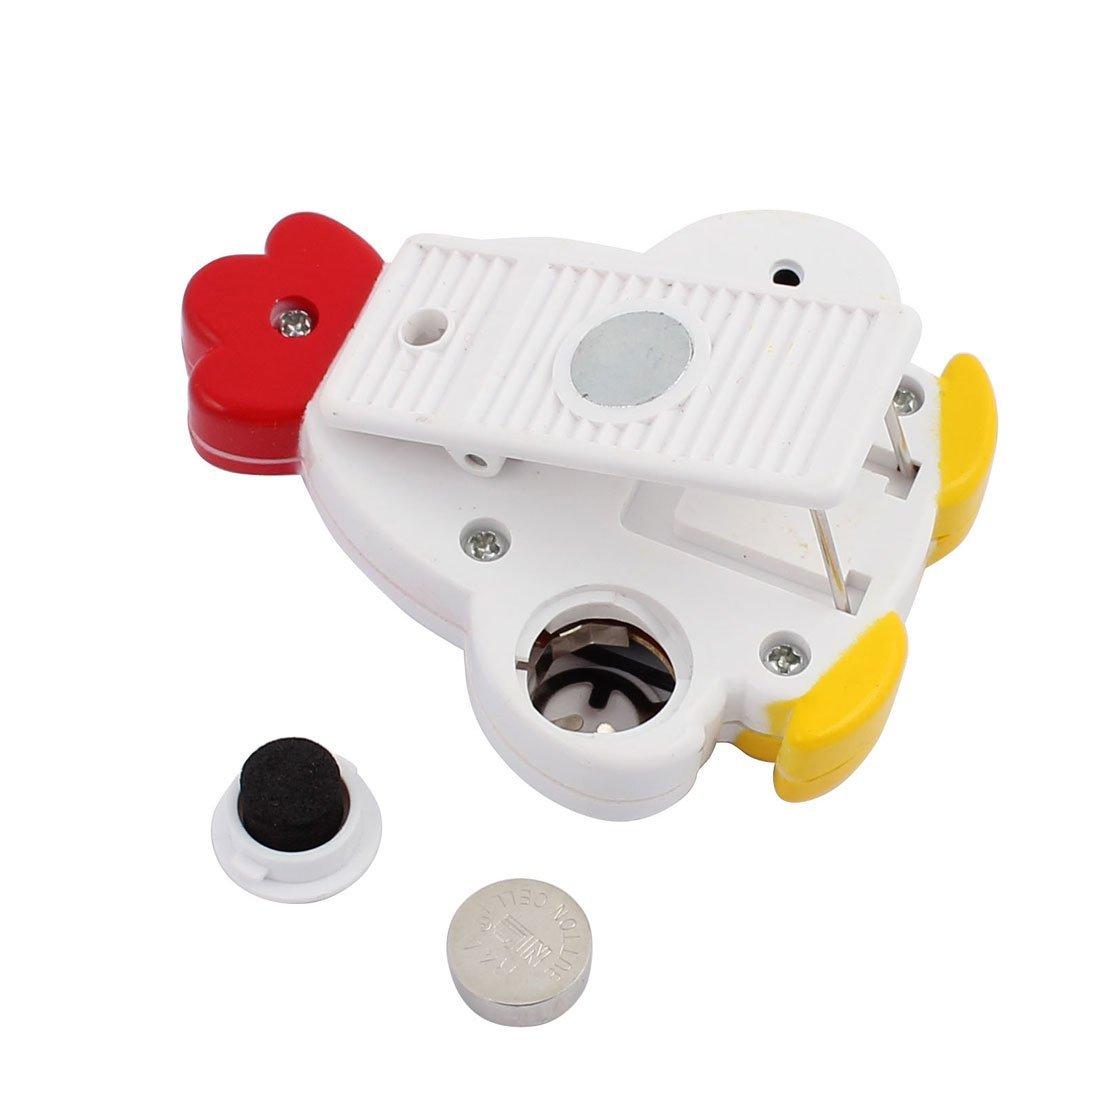 Amazon.com: Temporizador de cocina eDealMax LCD digital de dígitos grandes fuerte alarma magnética capa blanca: Kitchen & Dining